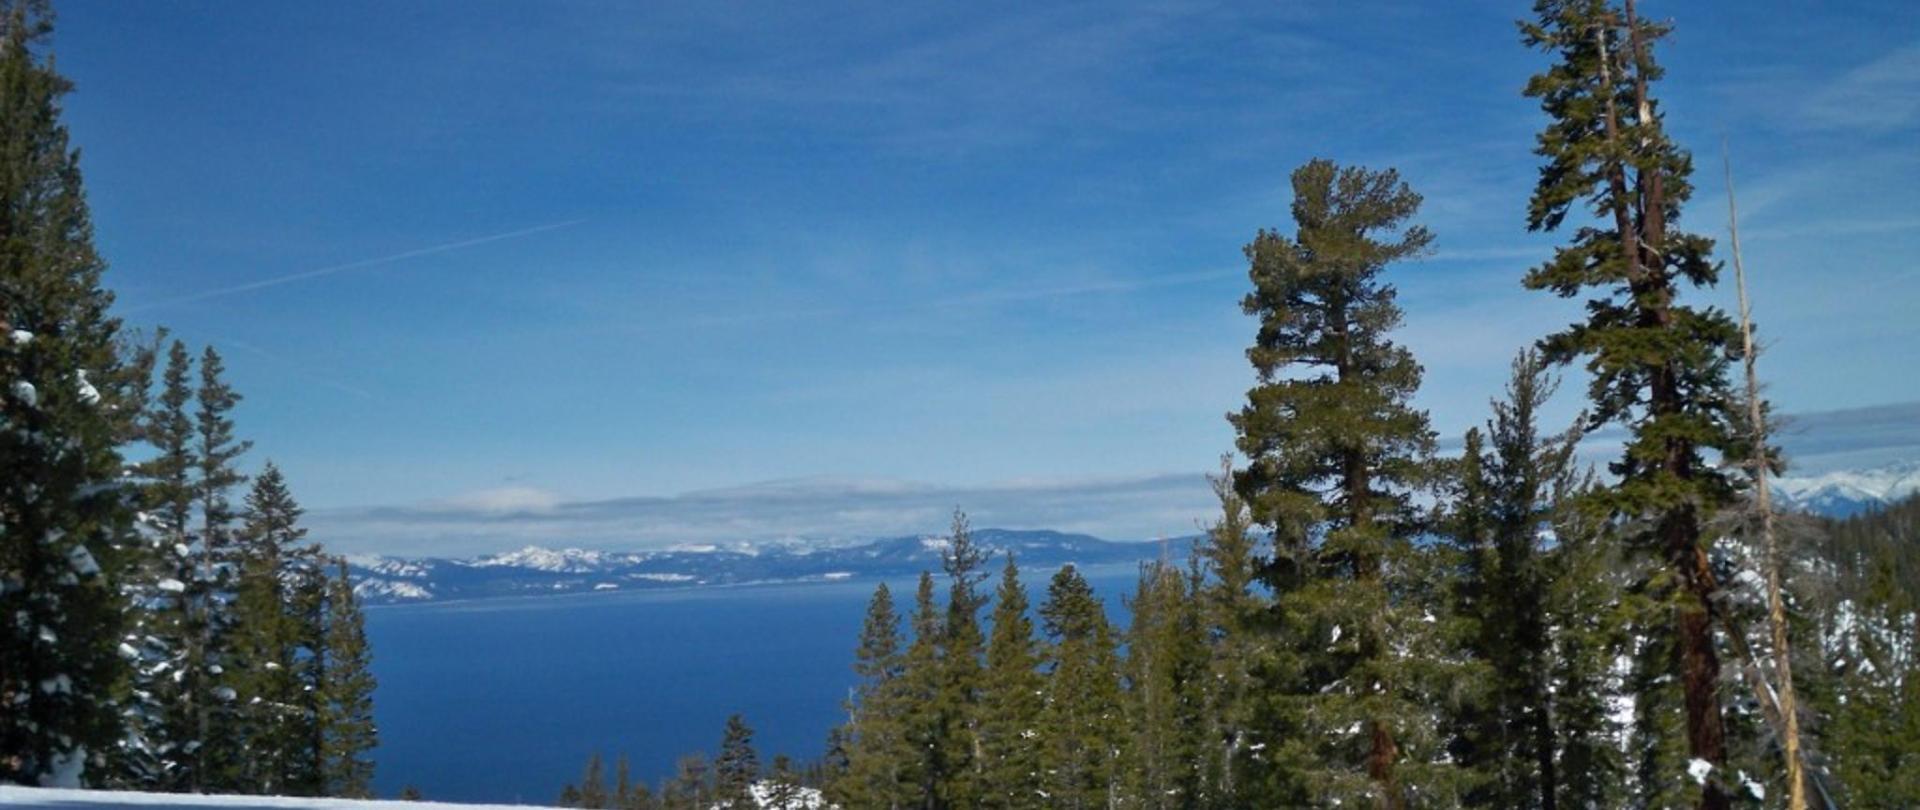 aa1_Lake-Tahoe-002-1024x768.jpg